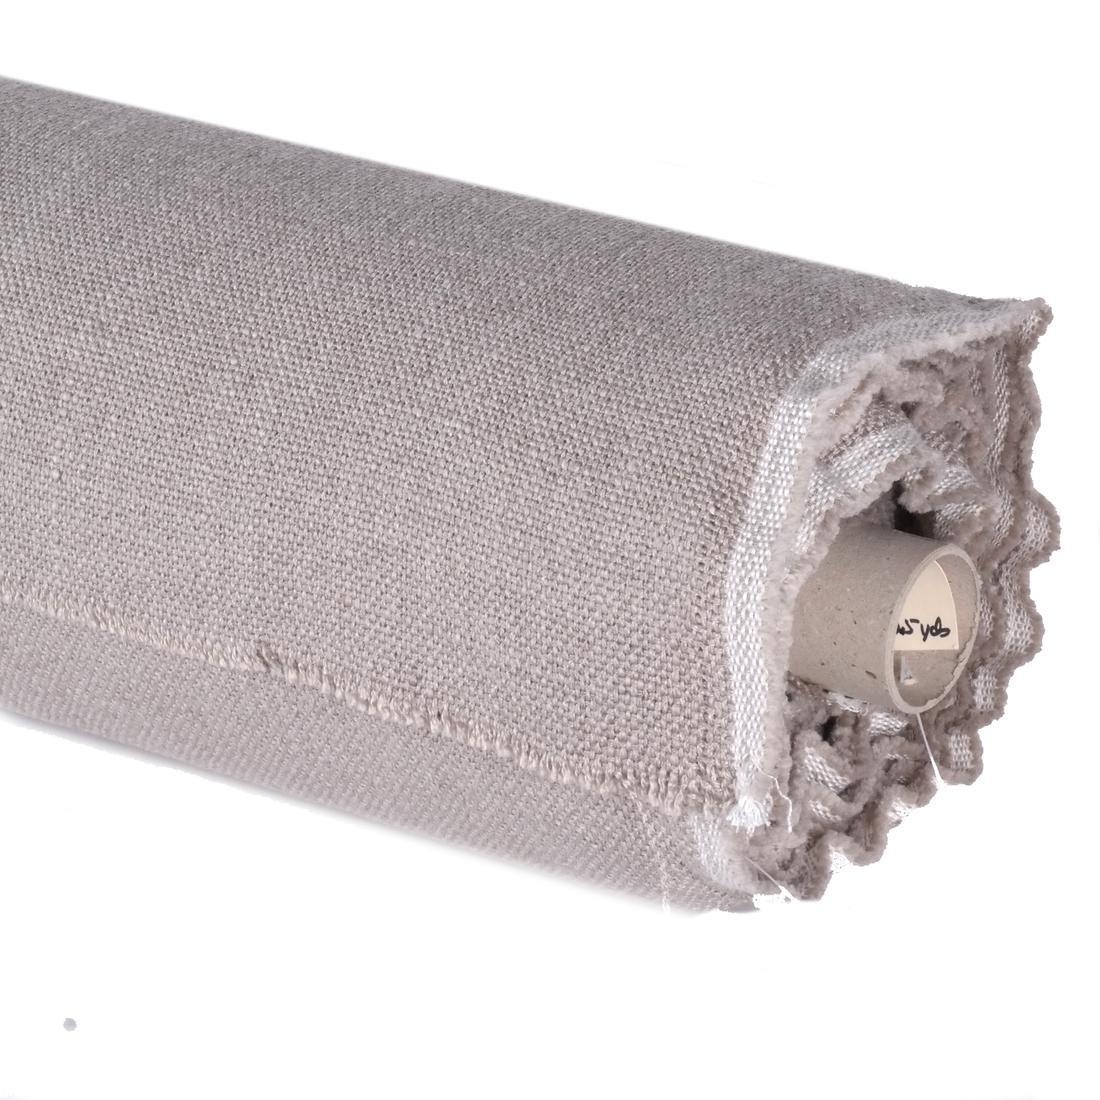 Holly Hunt Upholstery Fabric Bolt